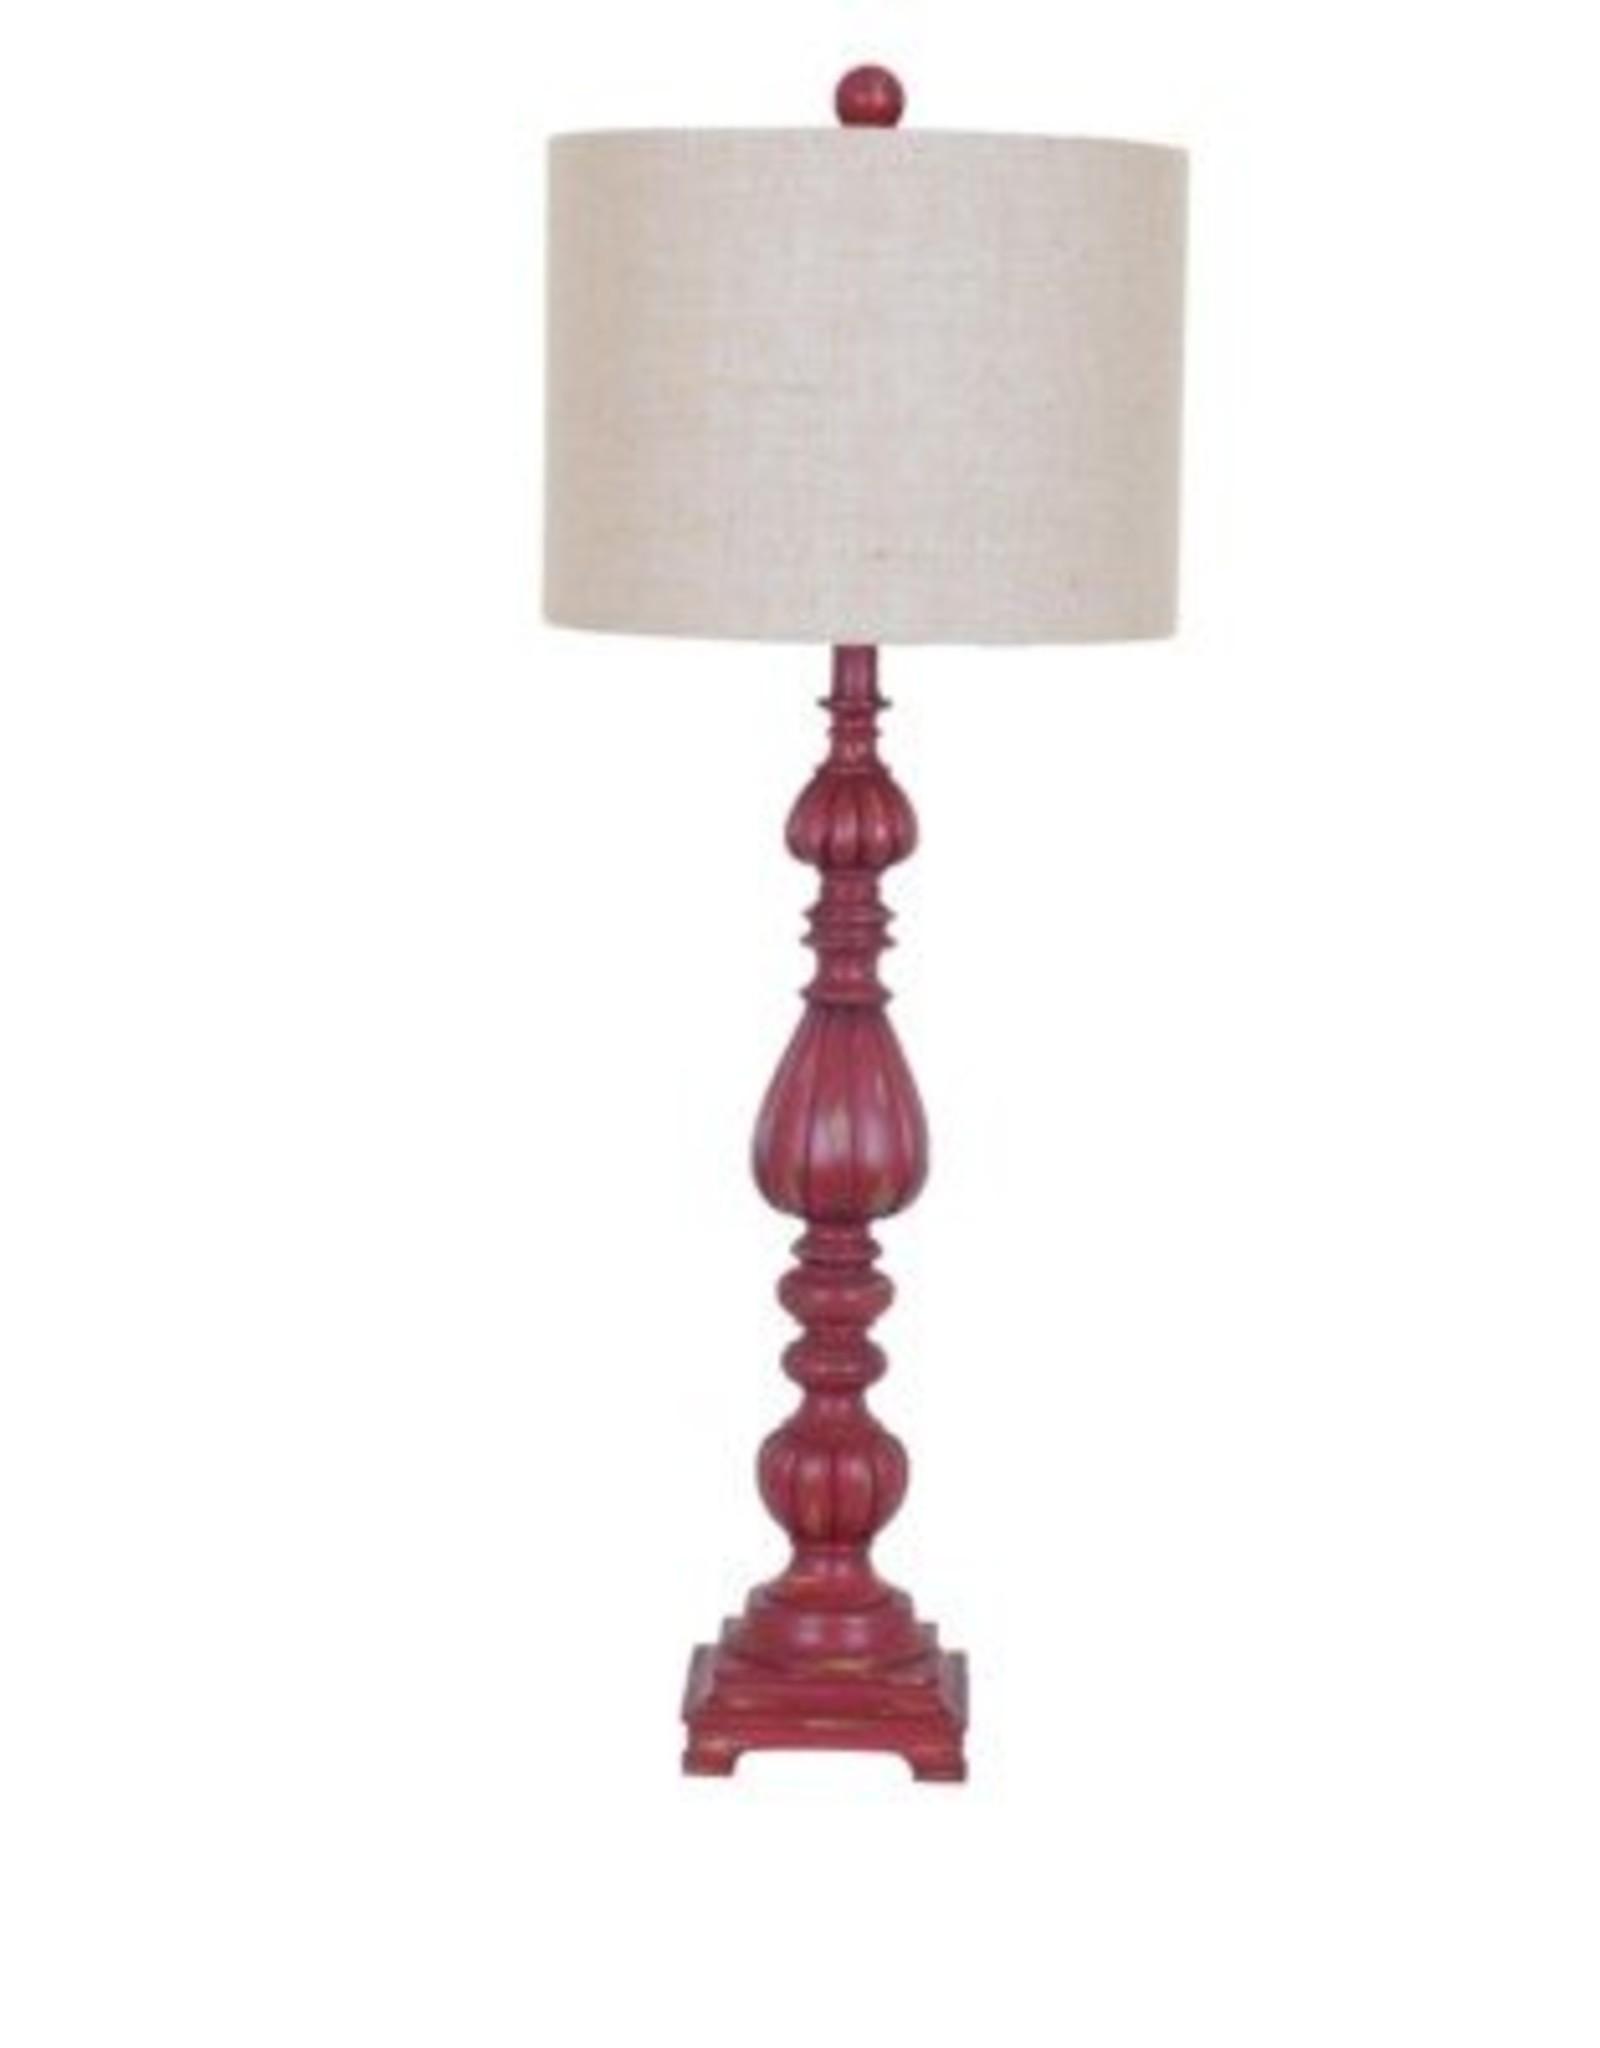 Crestview Slender Avian Distressed Red Lamp w/ Shade